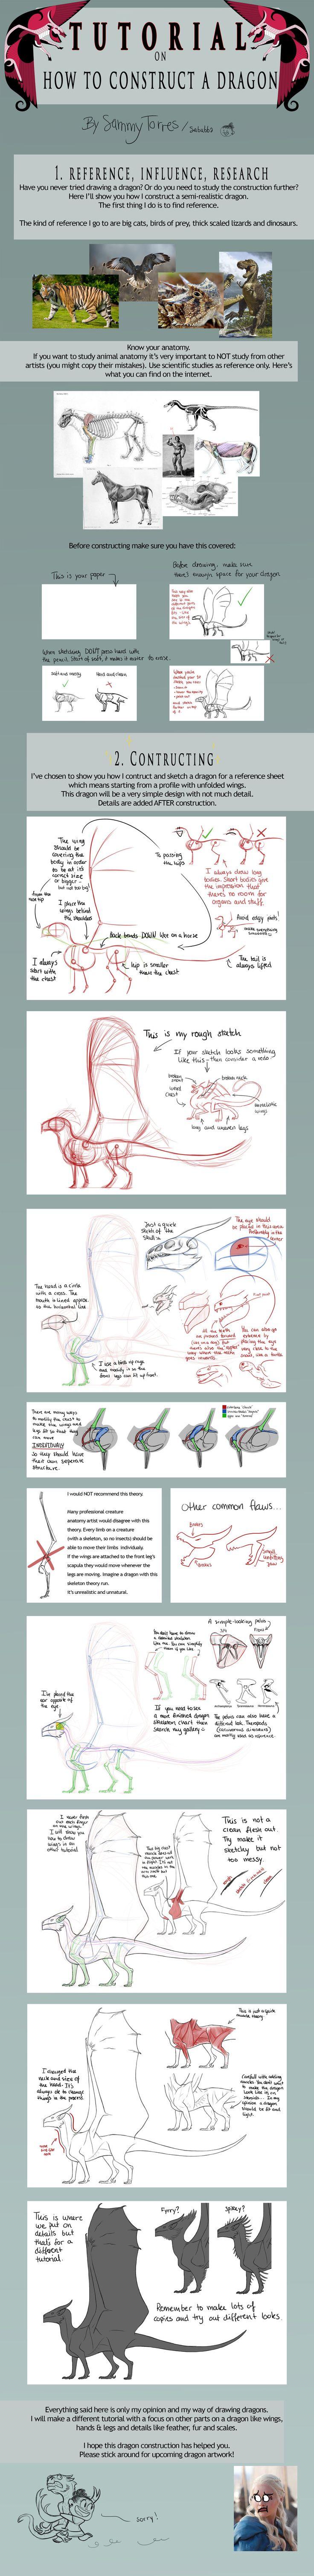 TUTORIAL: How to Construct a Dragon by SammyTorres.deviantart.com on @DeviantArt